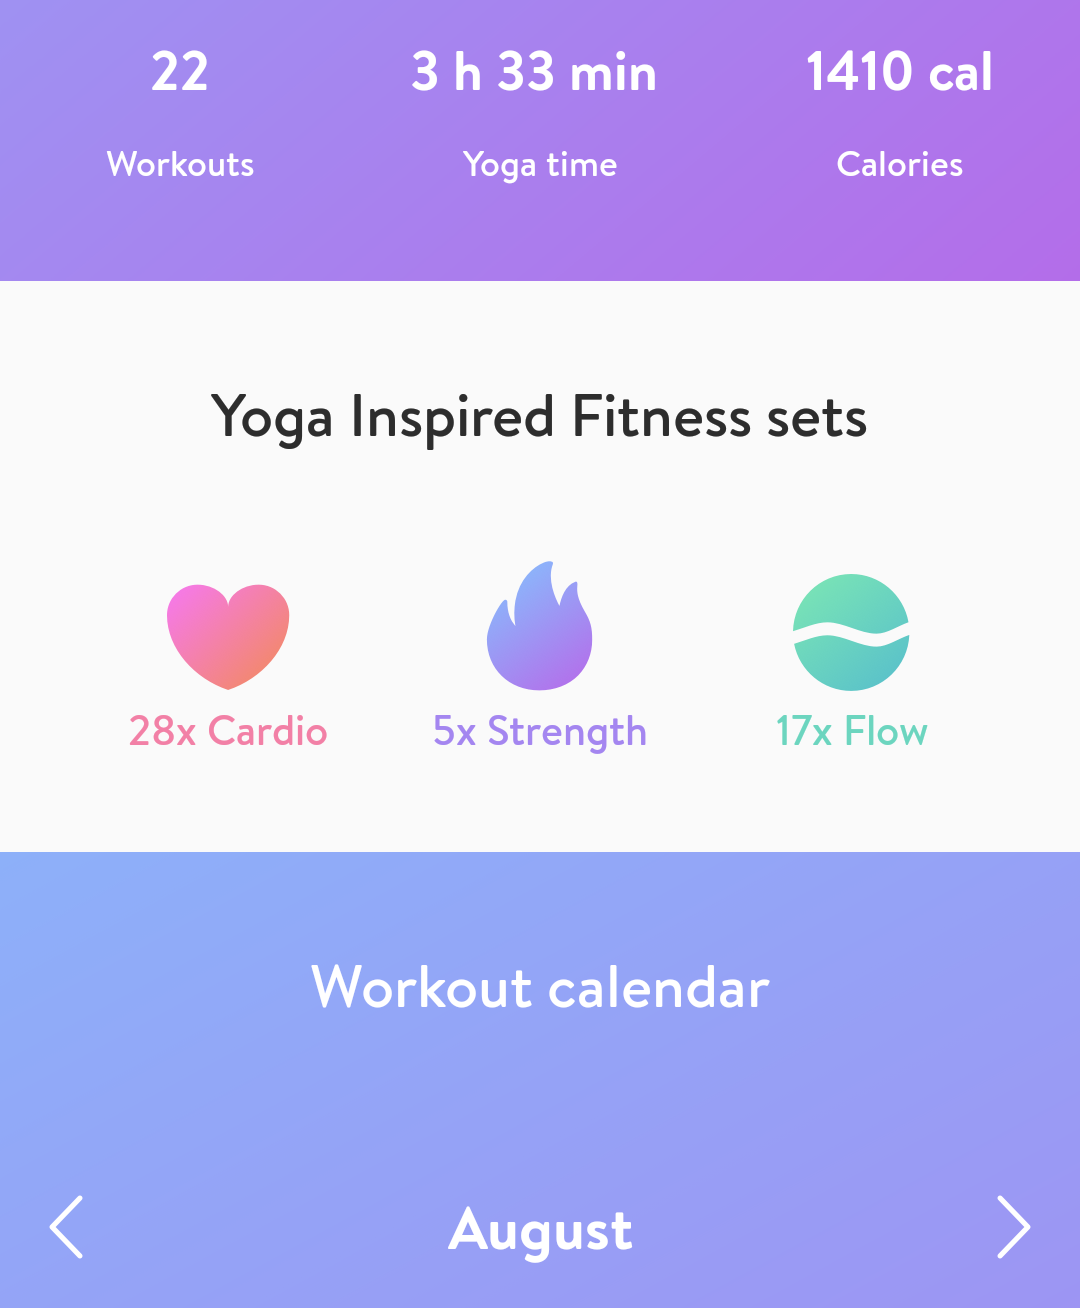 asana rebel, 7 holiday workouts you'll actually enjoy, by healthista (1)